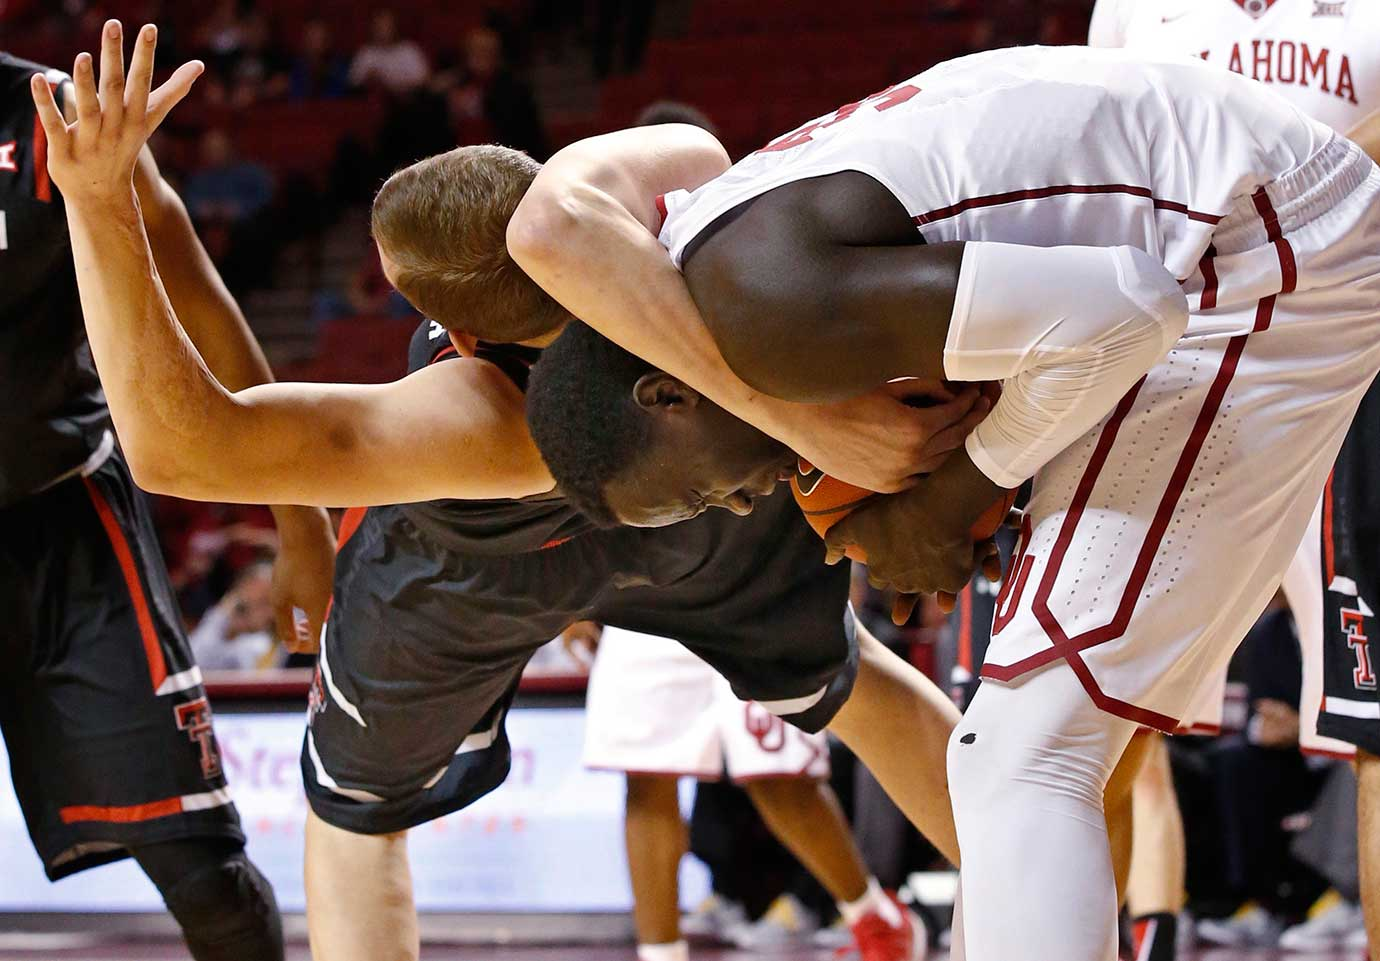 Texas Tech forward Rokas Ulvydas gets tangled up with Oklahoma center Akolda Manyang in Norman, Okla. Oklahoma won 91-67.